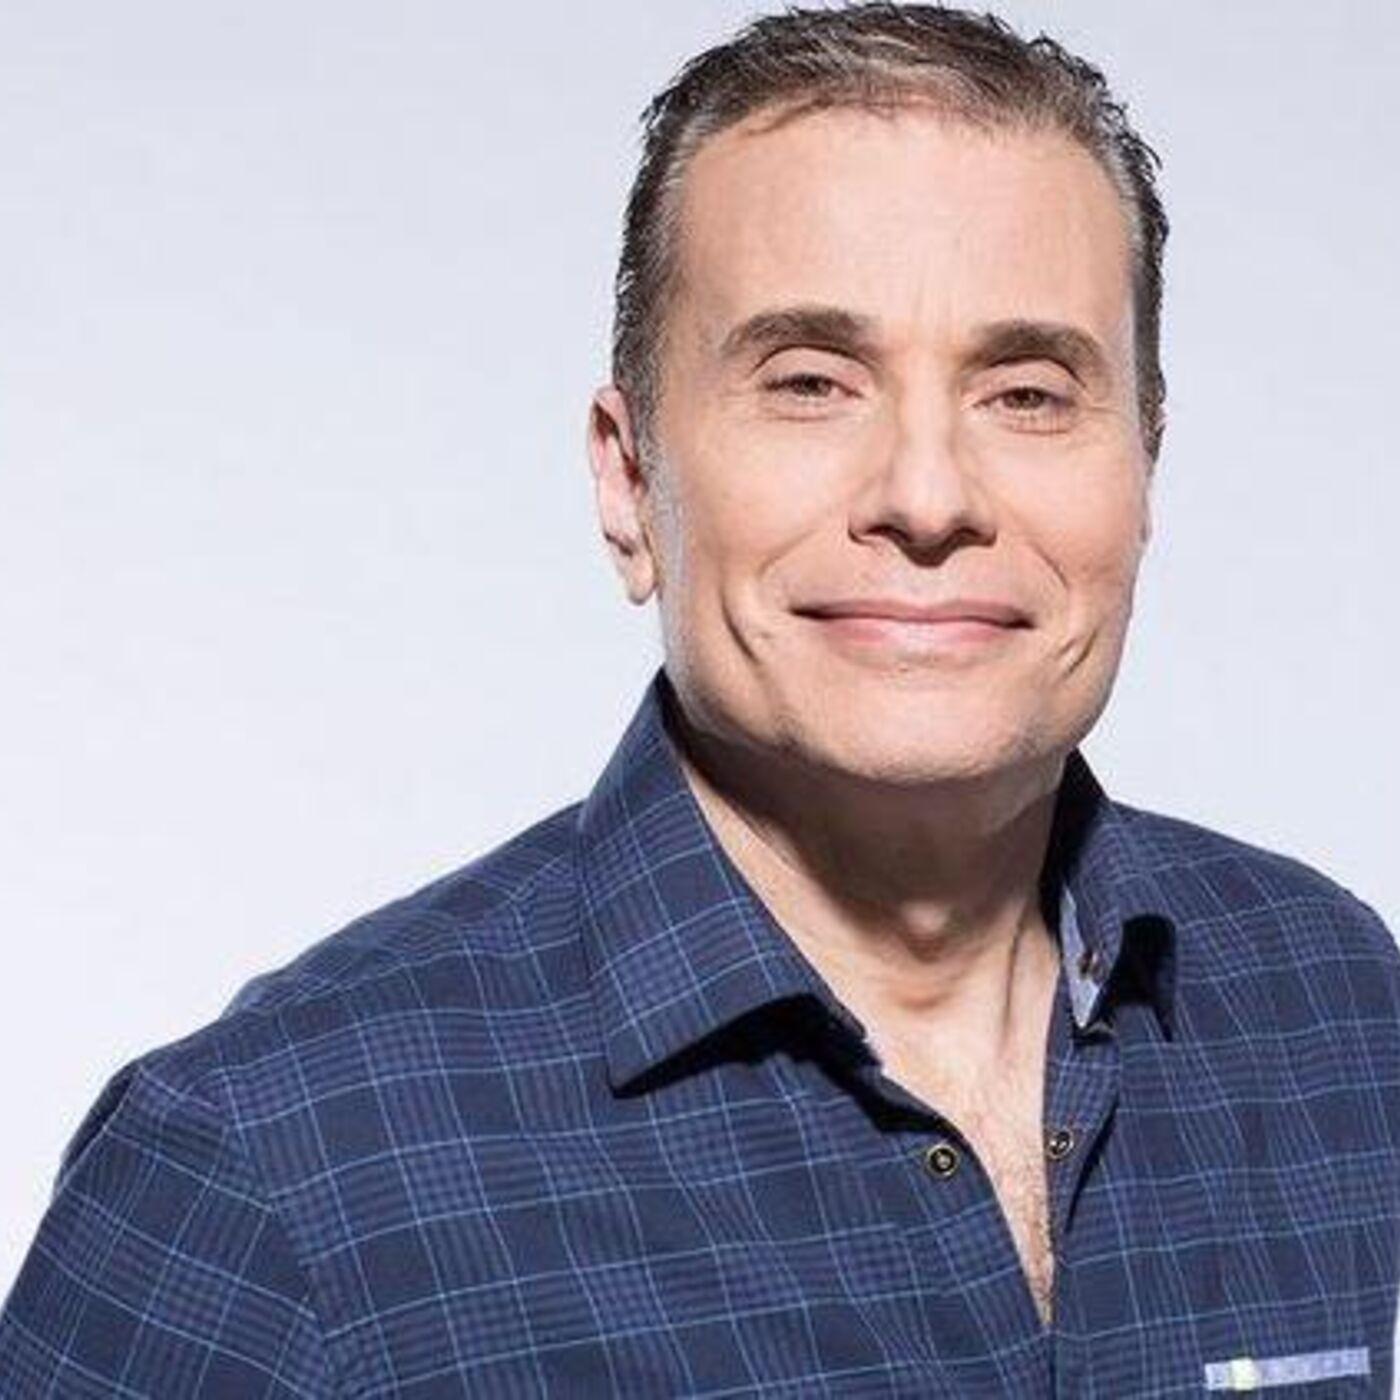 Episode 55 with Michael Landsberg - Veteran TSN Broadcaster, Founder of #SickNotWeak